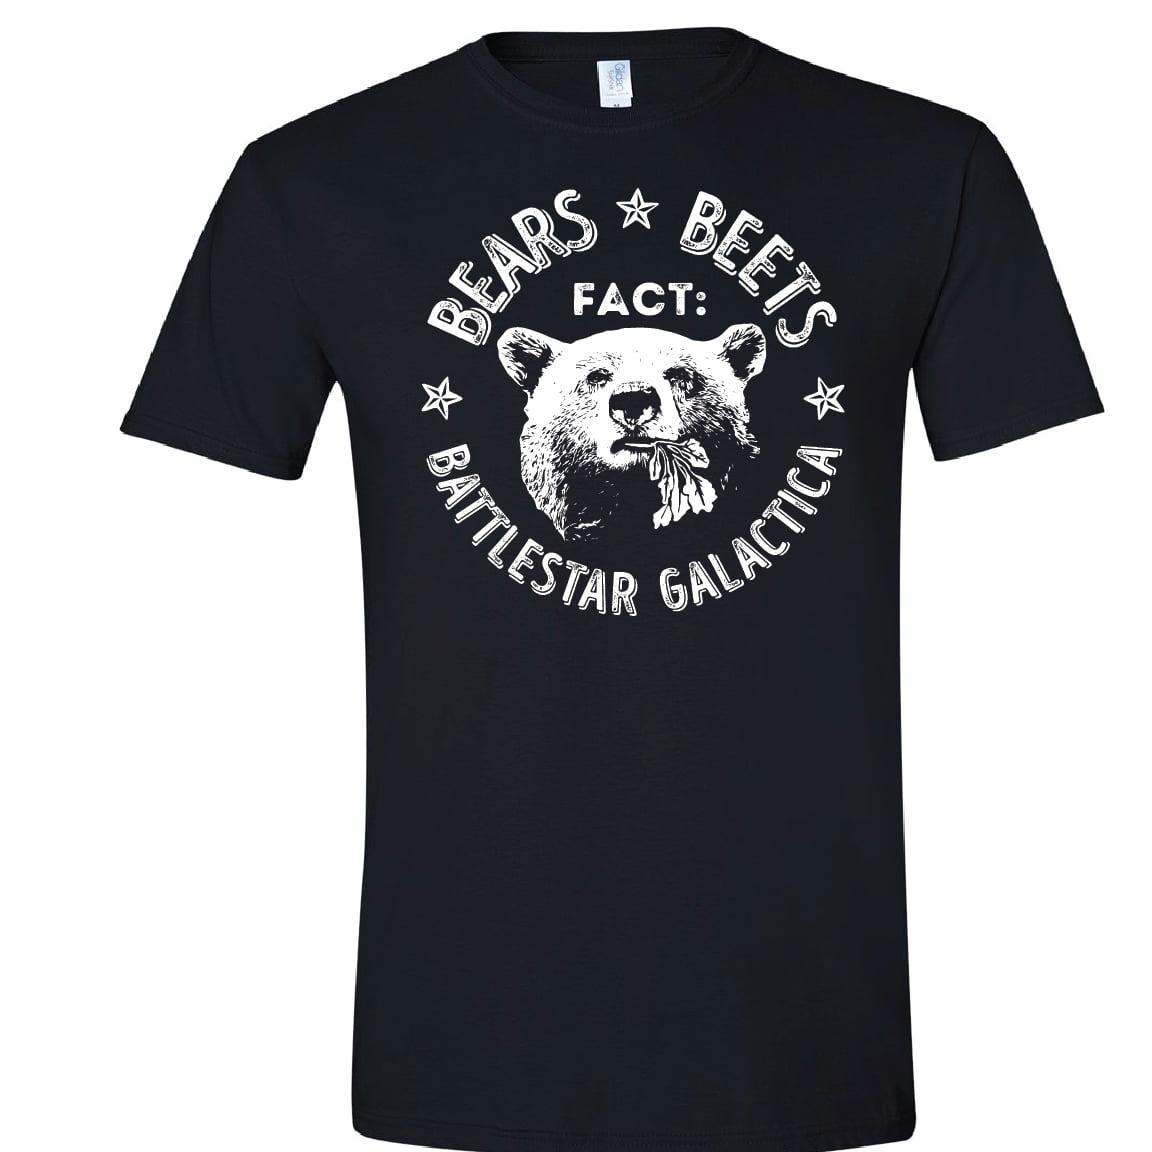 The Office Tee, Fact, Bears Eat Beets, Battlestar Gallactica, Small, Black